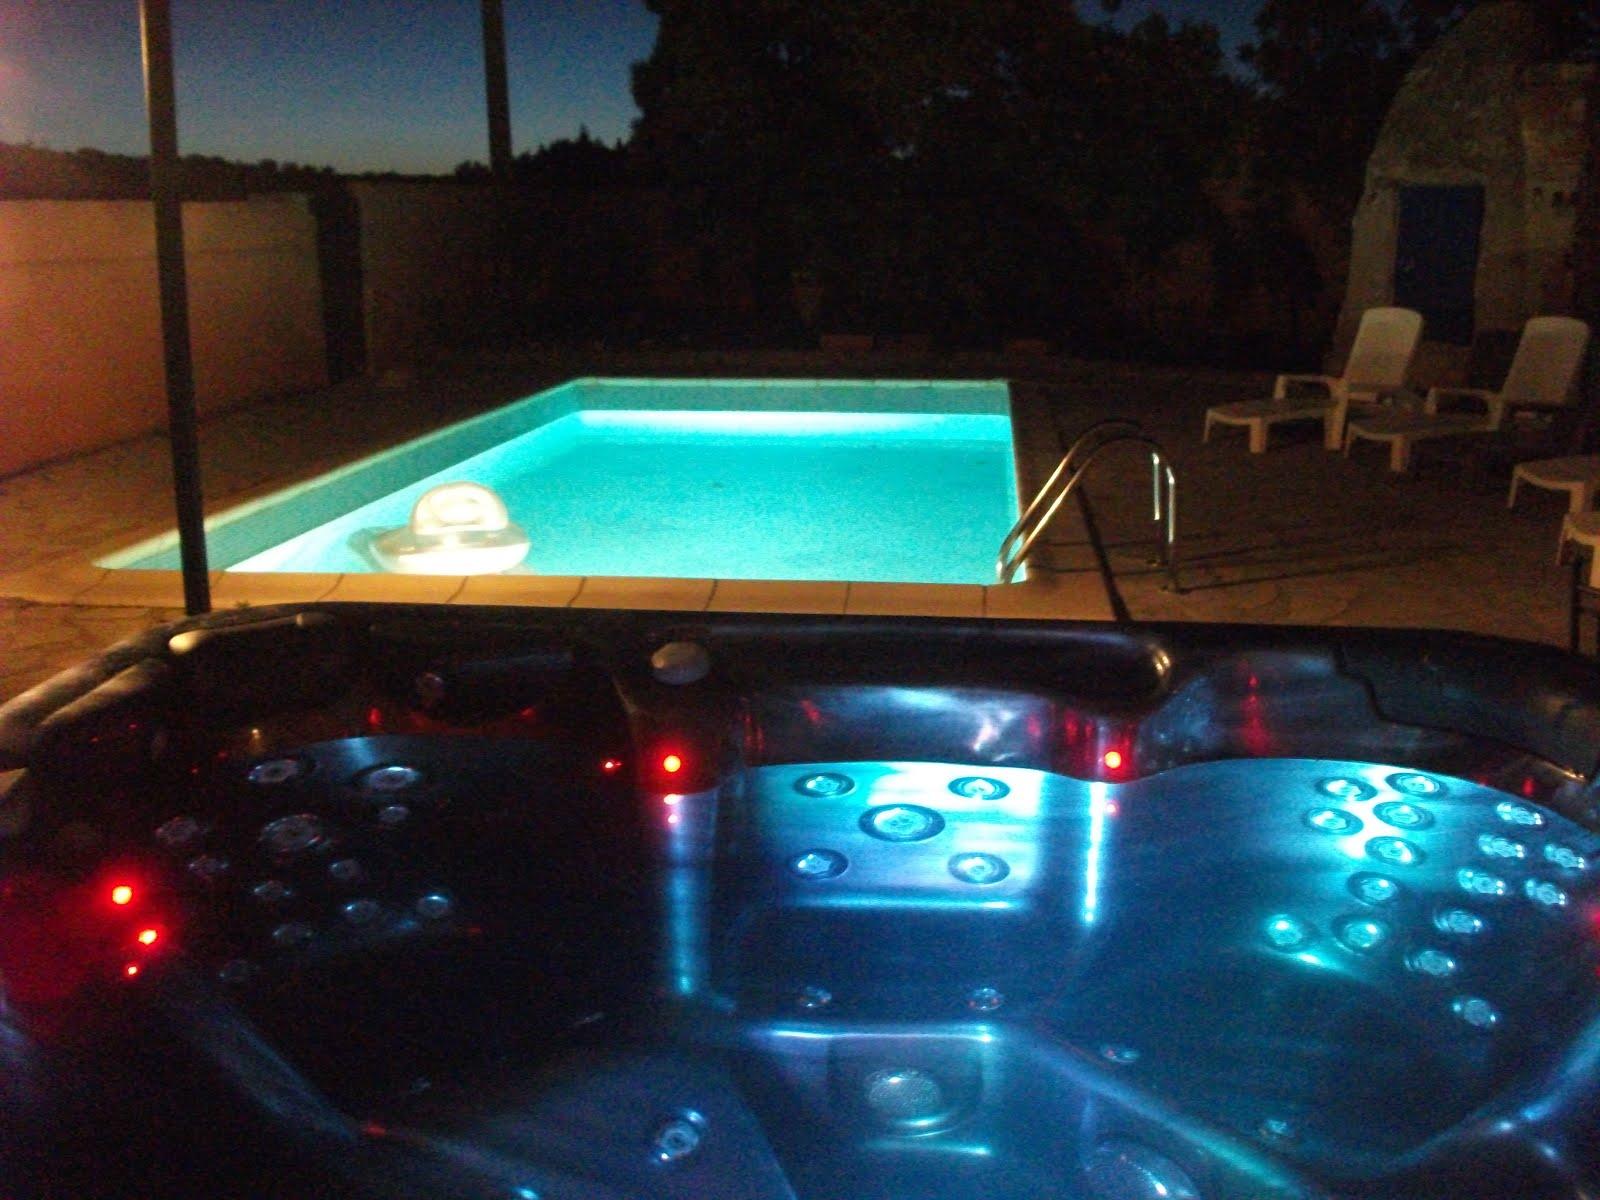 Villa olivier - spa et piscine la nuit